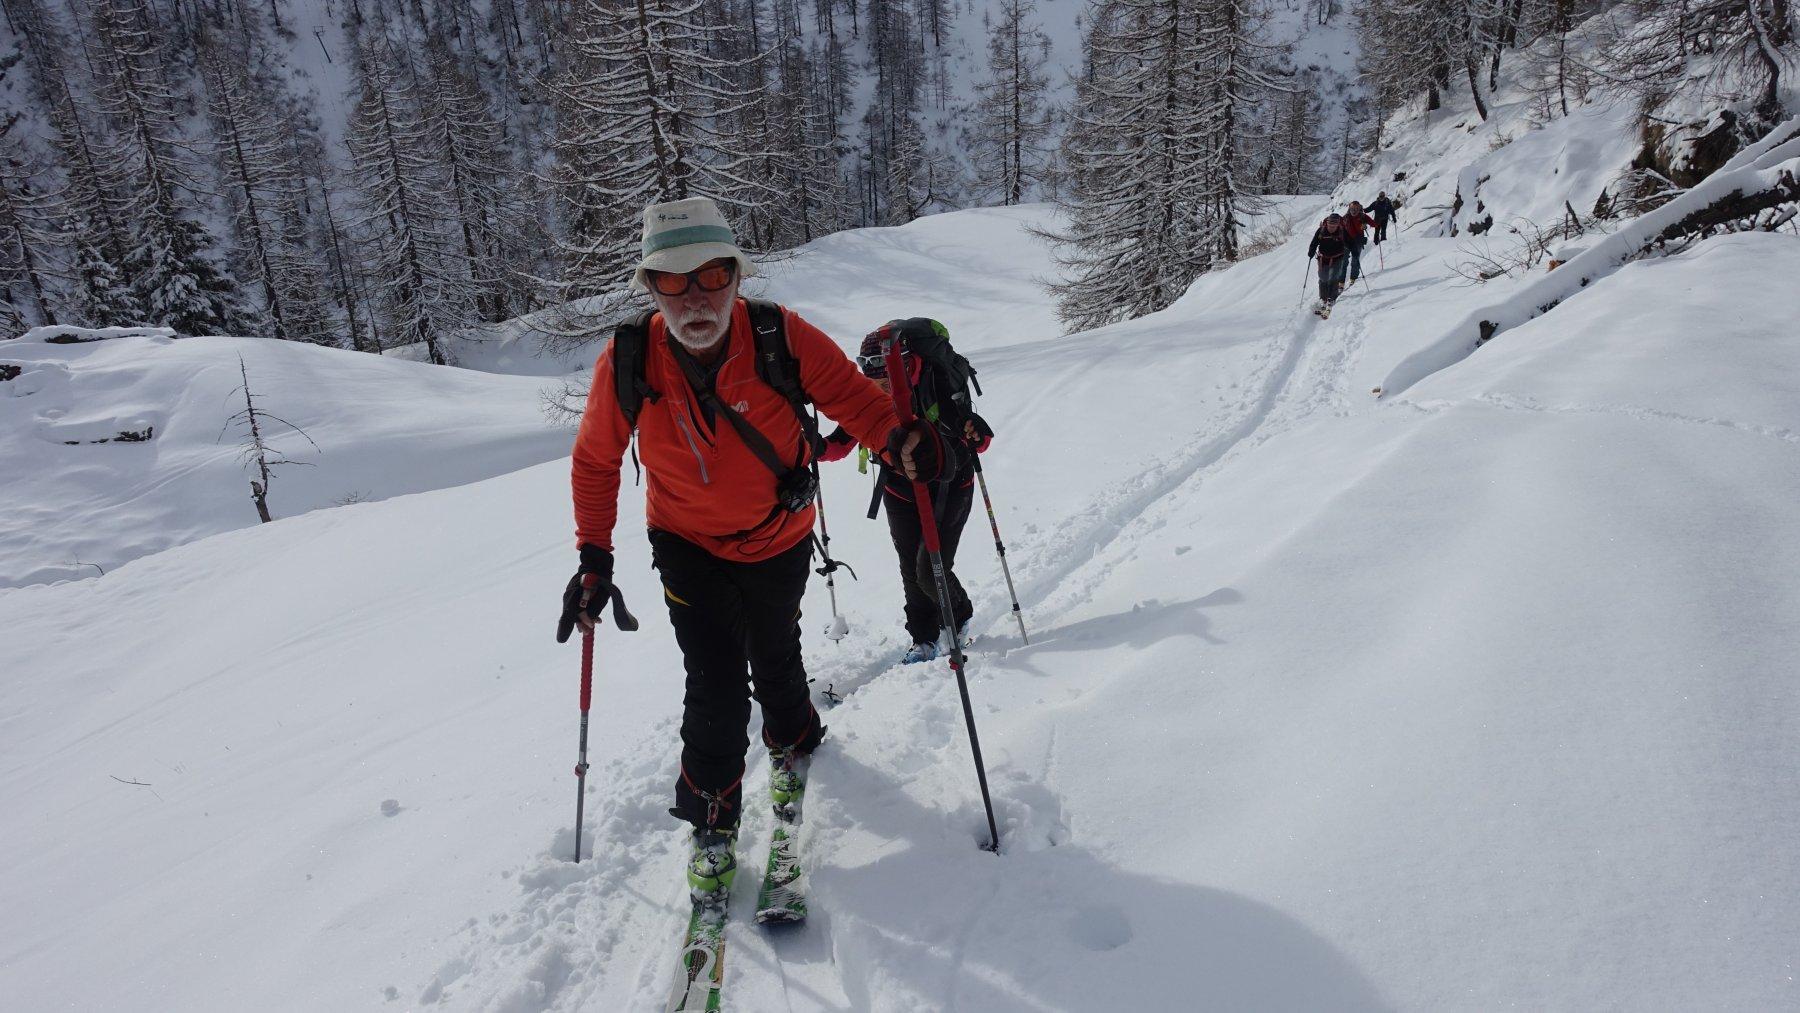 Verso l'alpe Champlong